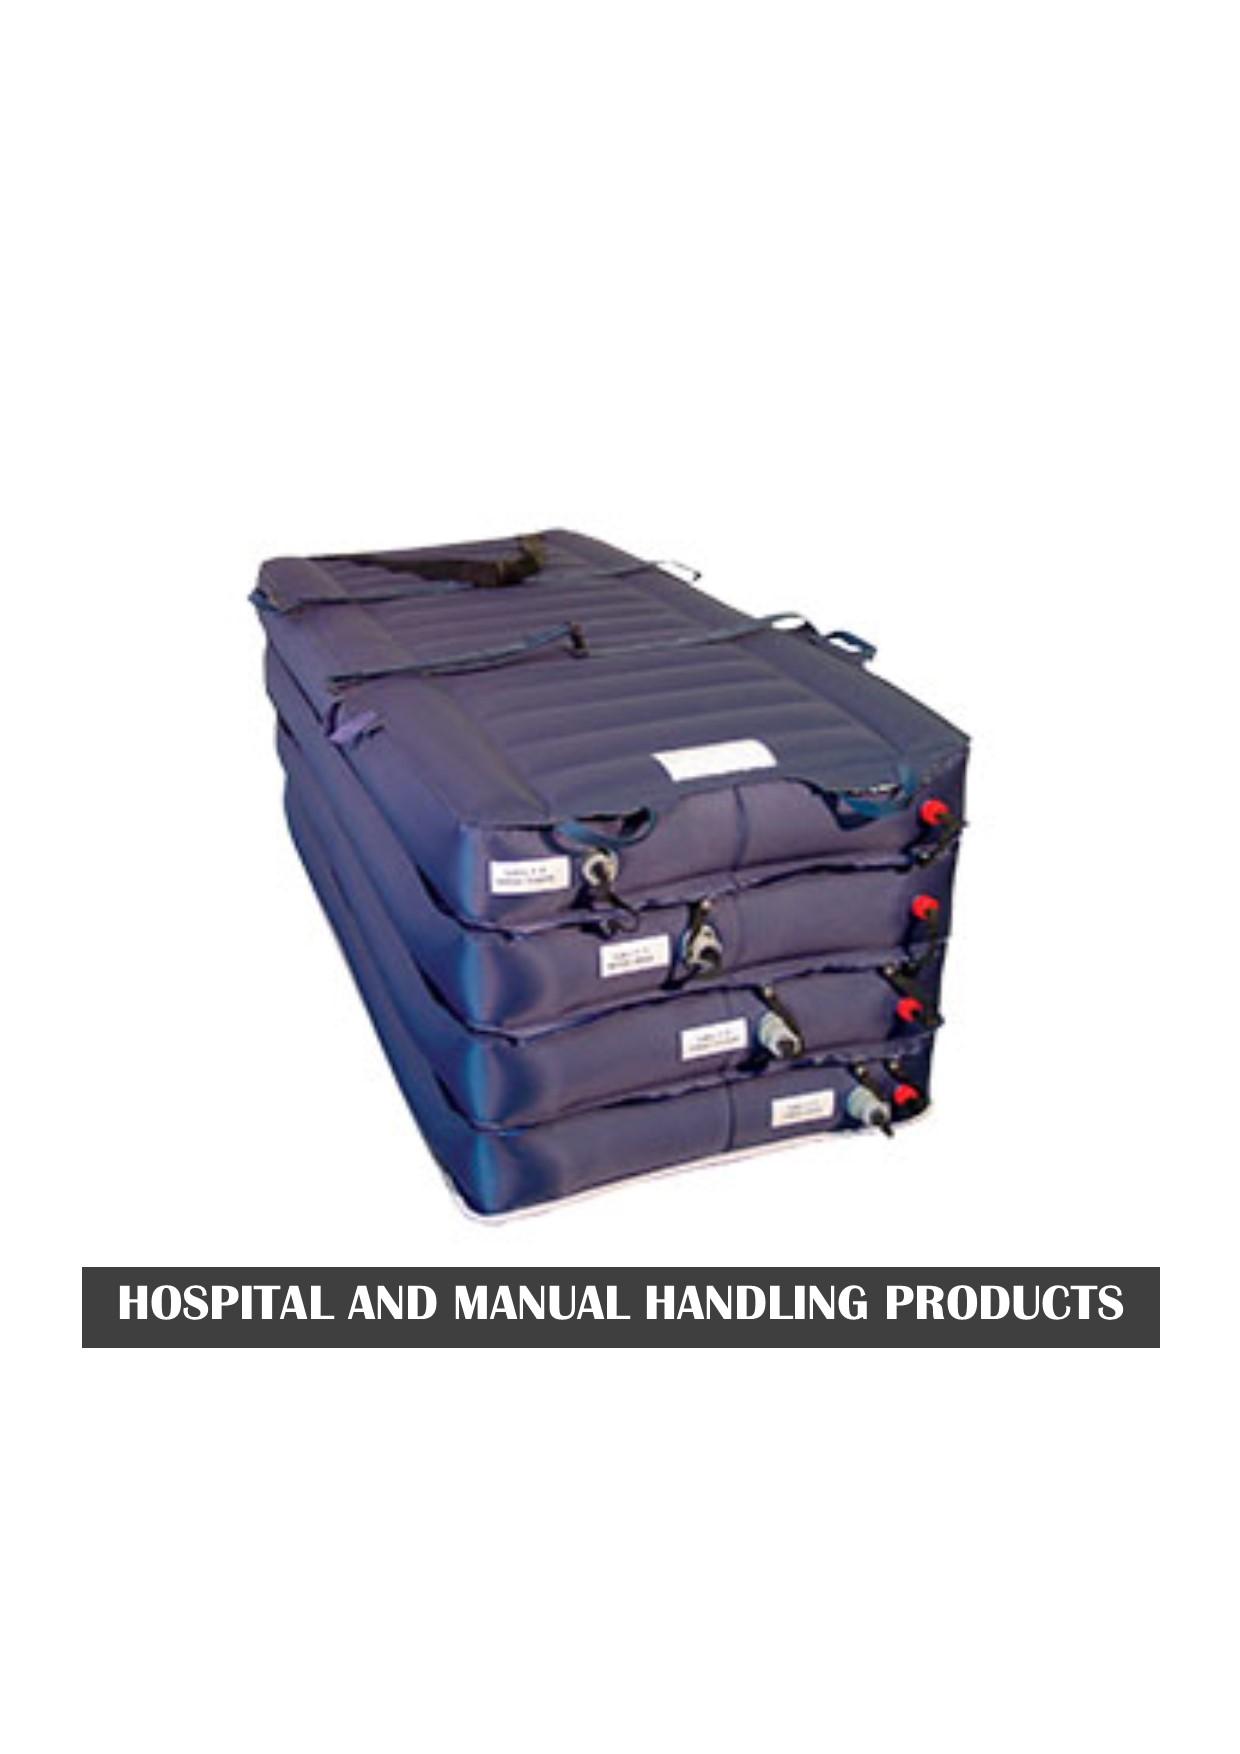 Hospital and manual handling